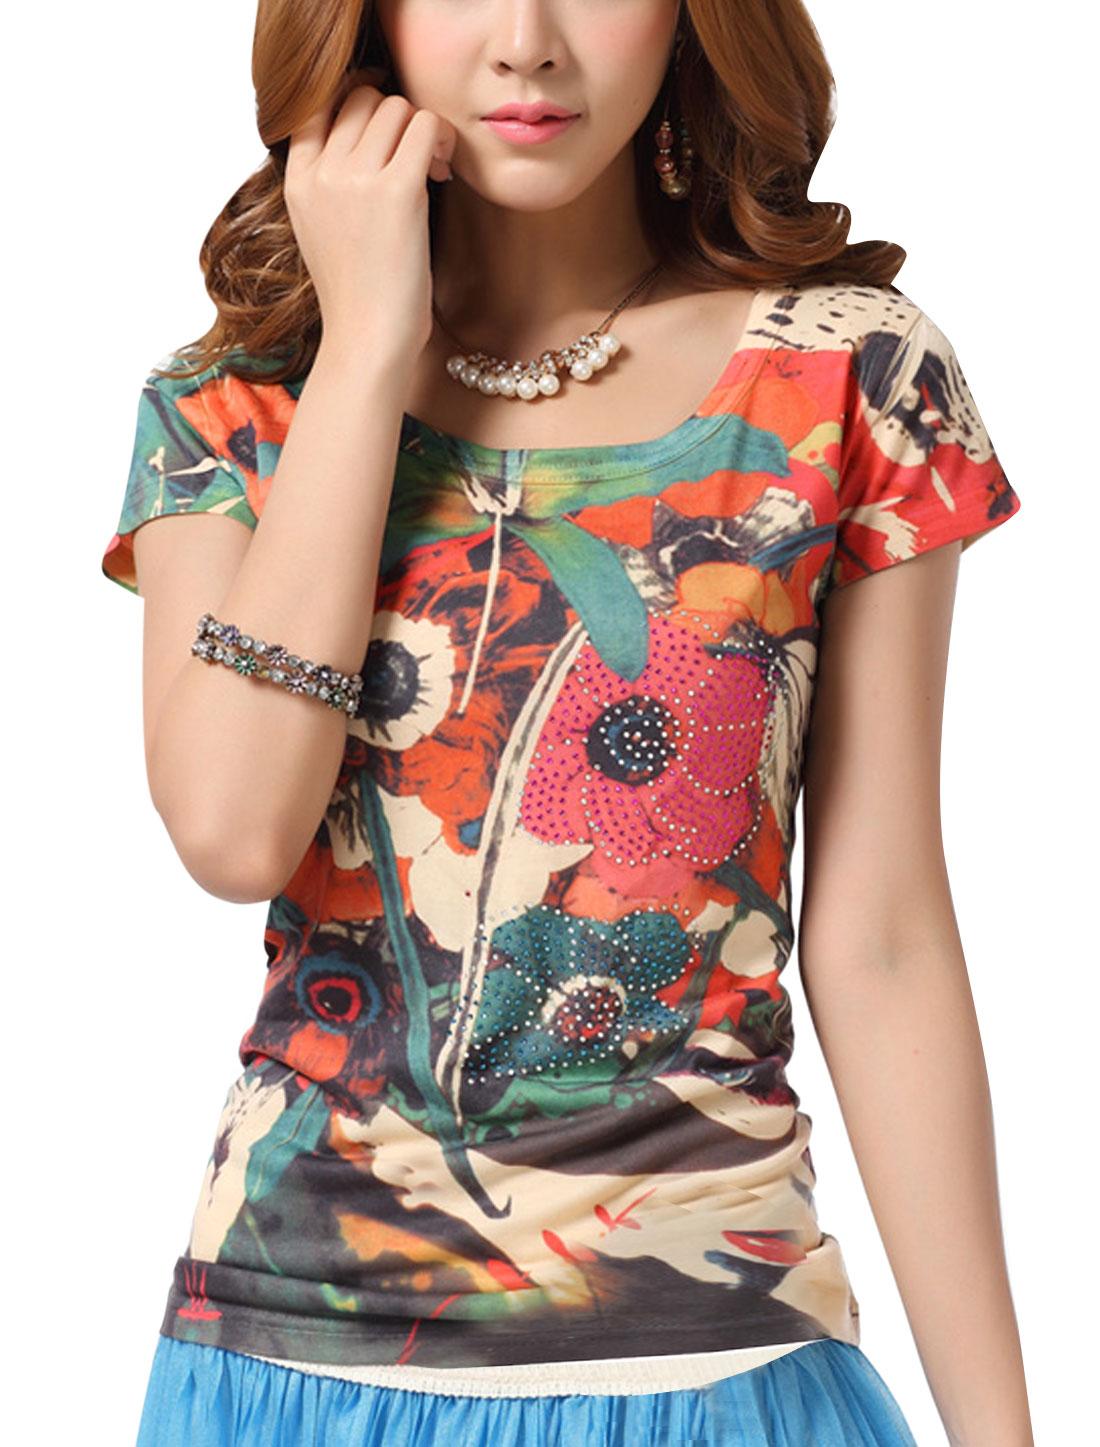 Lady Short Sleeve Floral Prints Rhinestone Decor T-Shirt Multicolor S